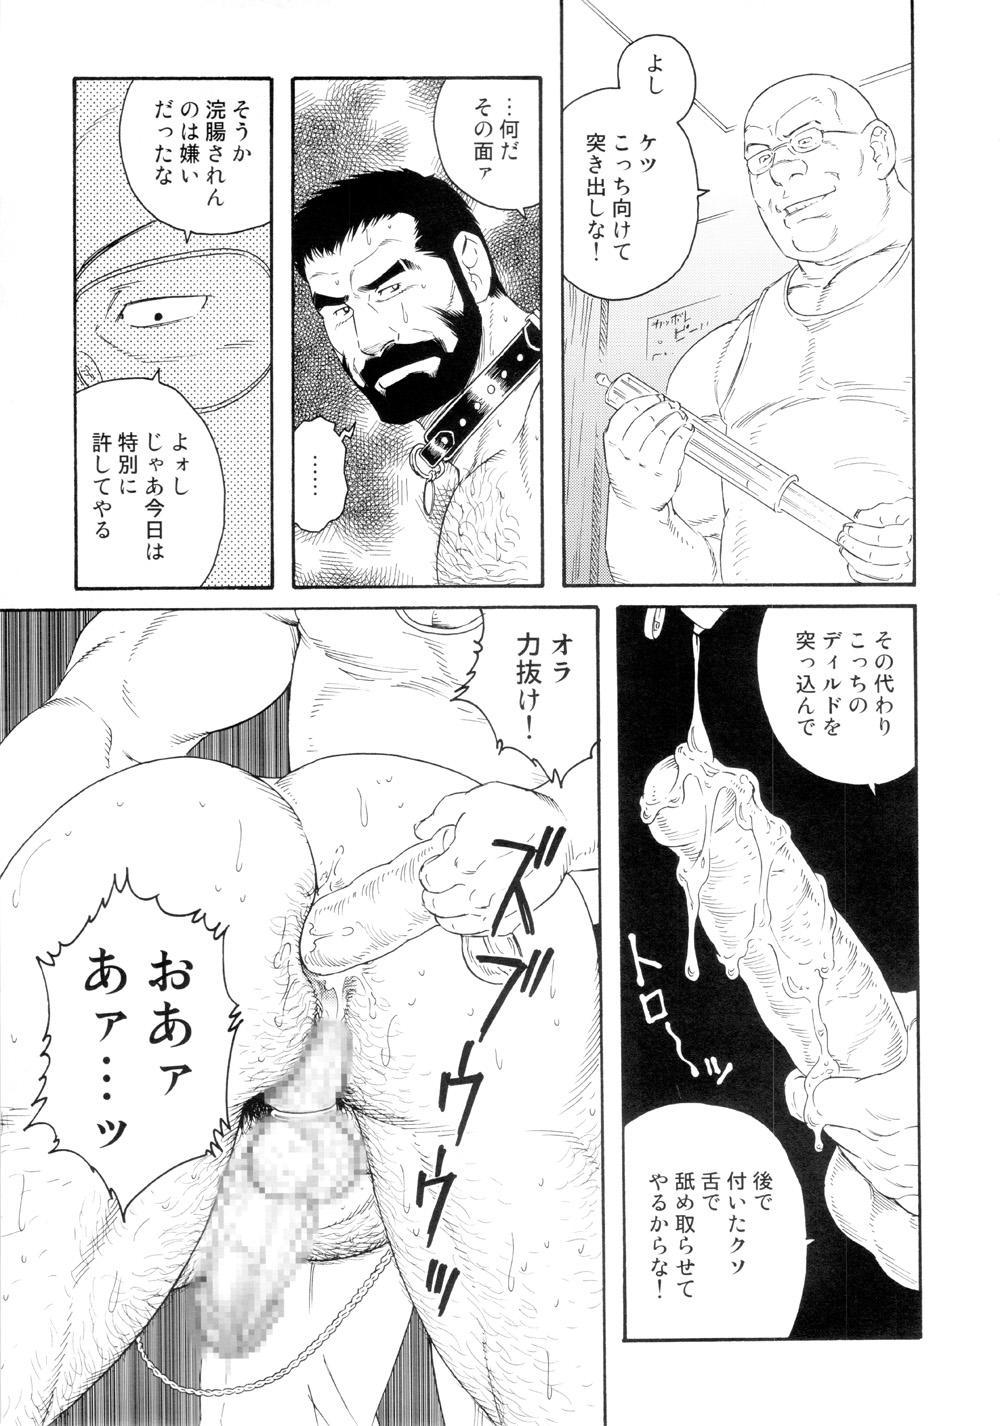 Genryu Chapter 1 10